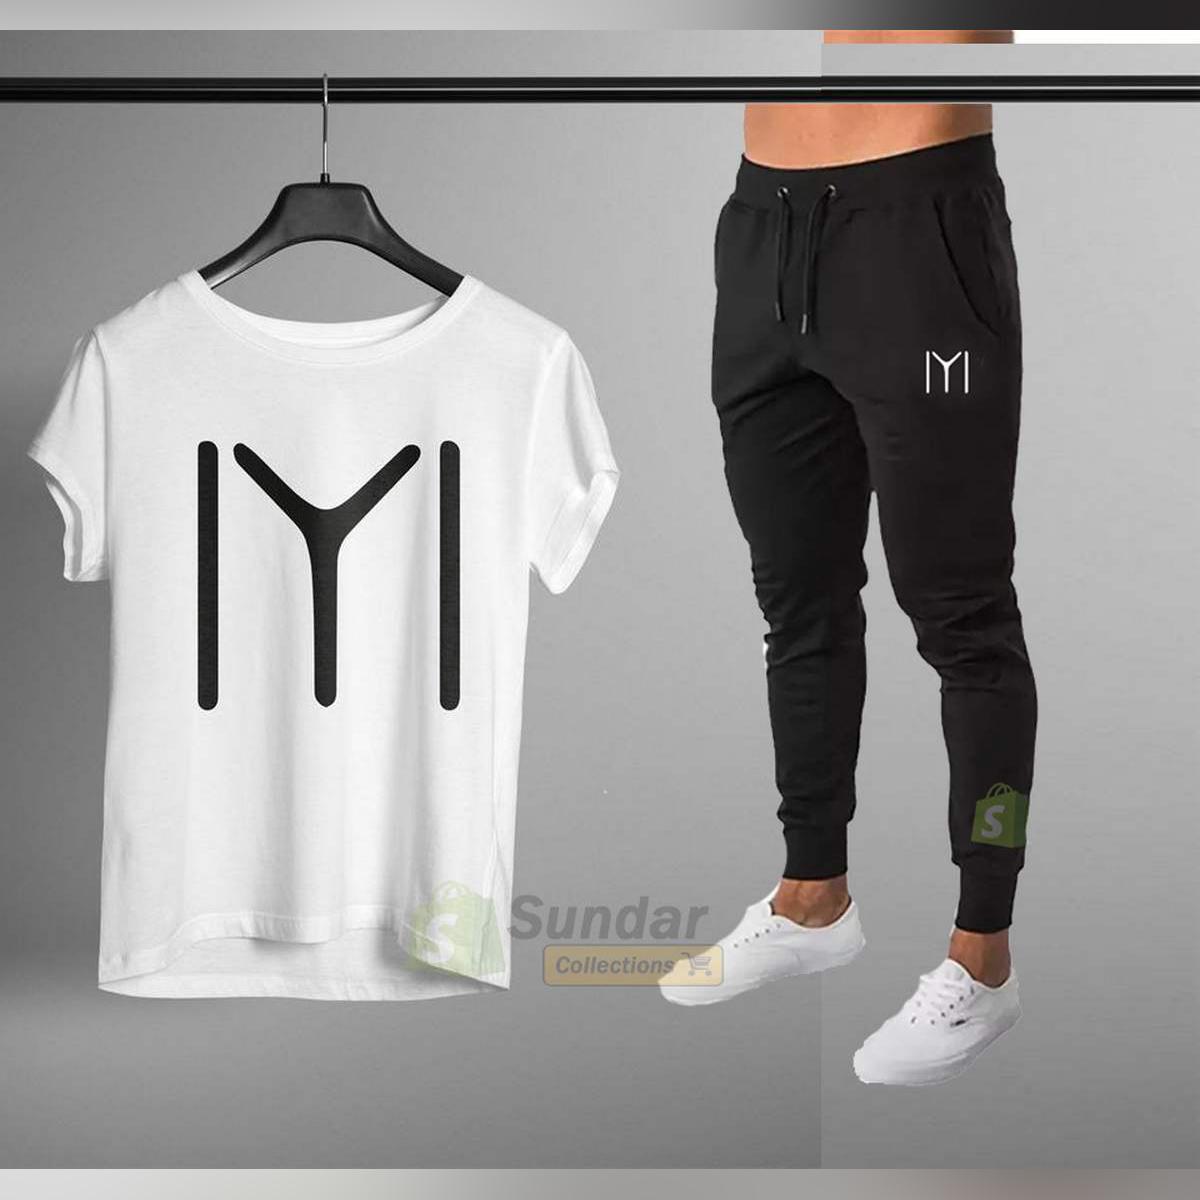 Ertugrul Kayi Full Track Suit For Summer Shirt and Trouser